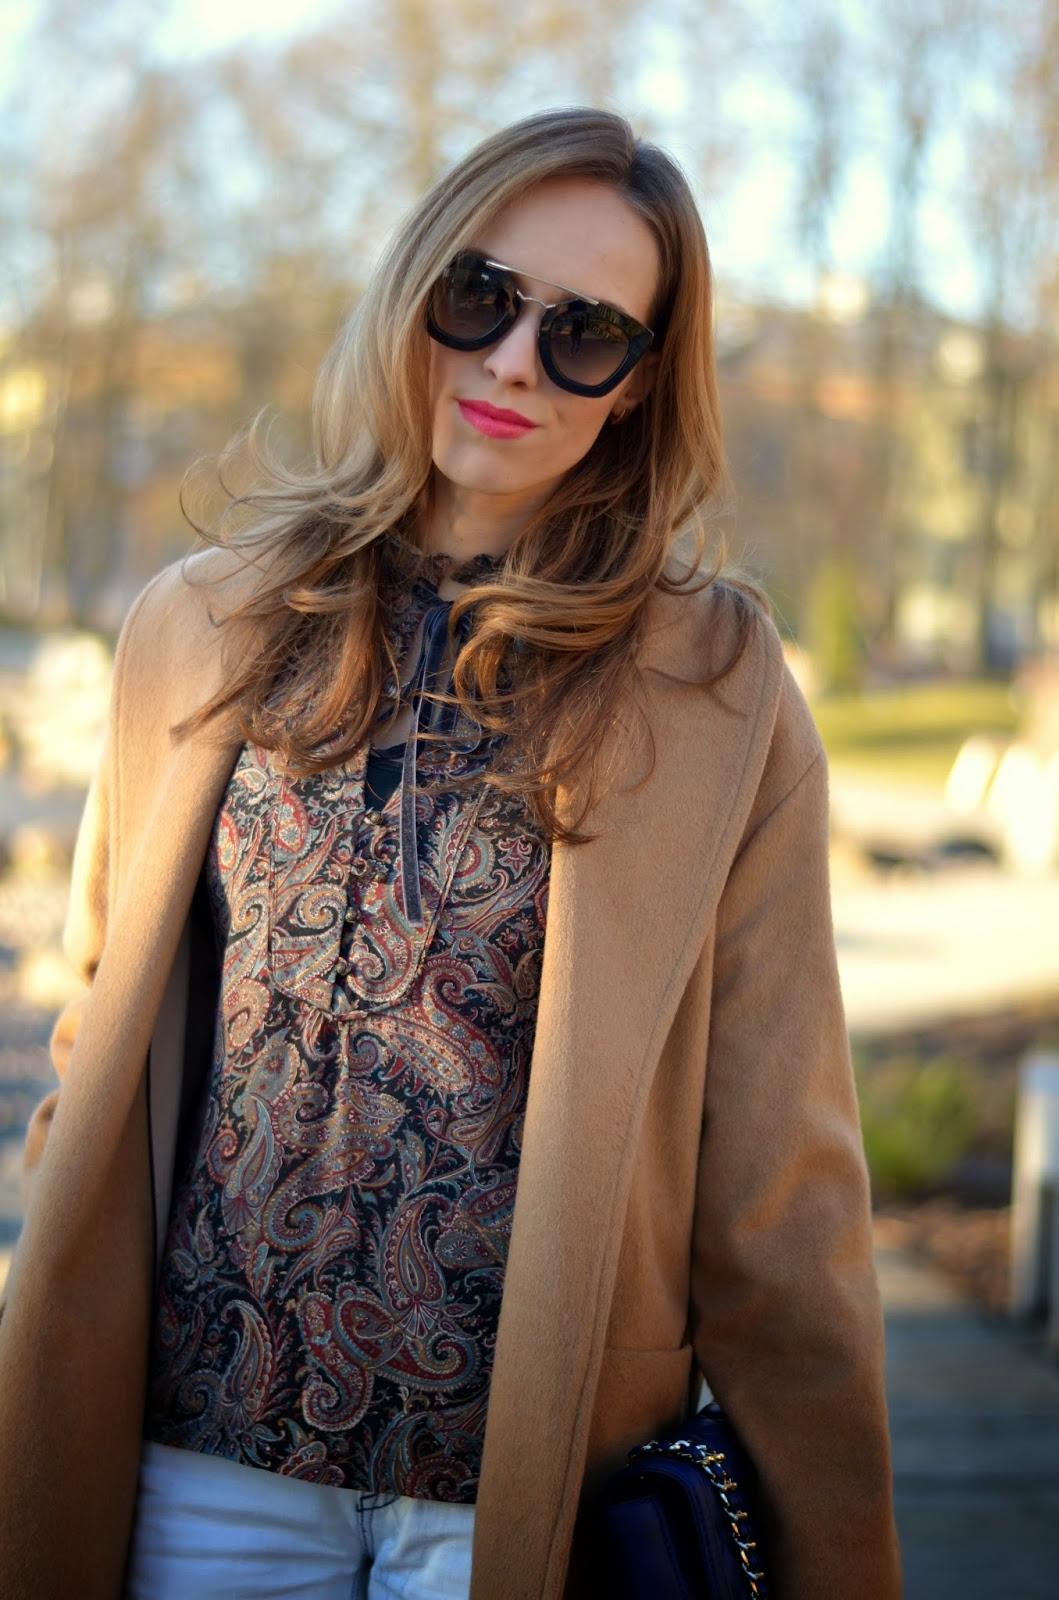 kristjaana mere printed top camel coat spring outfit